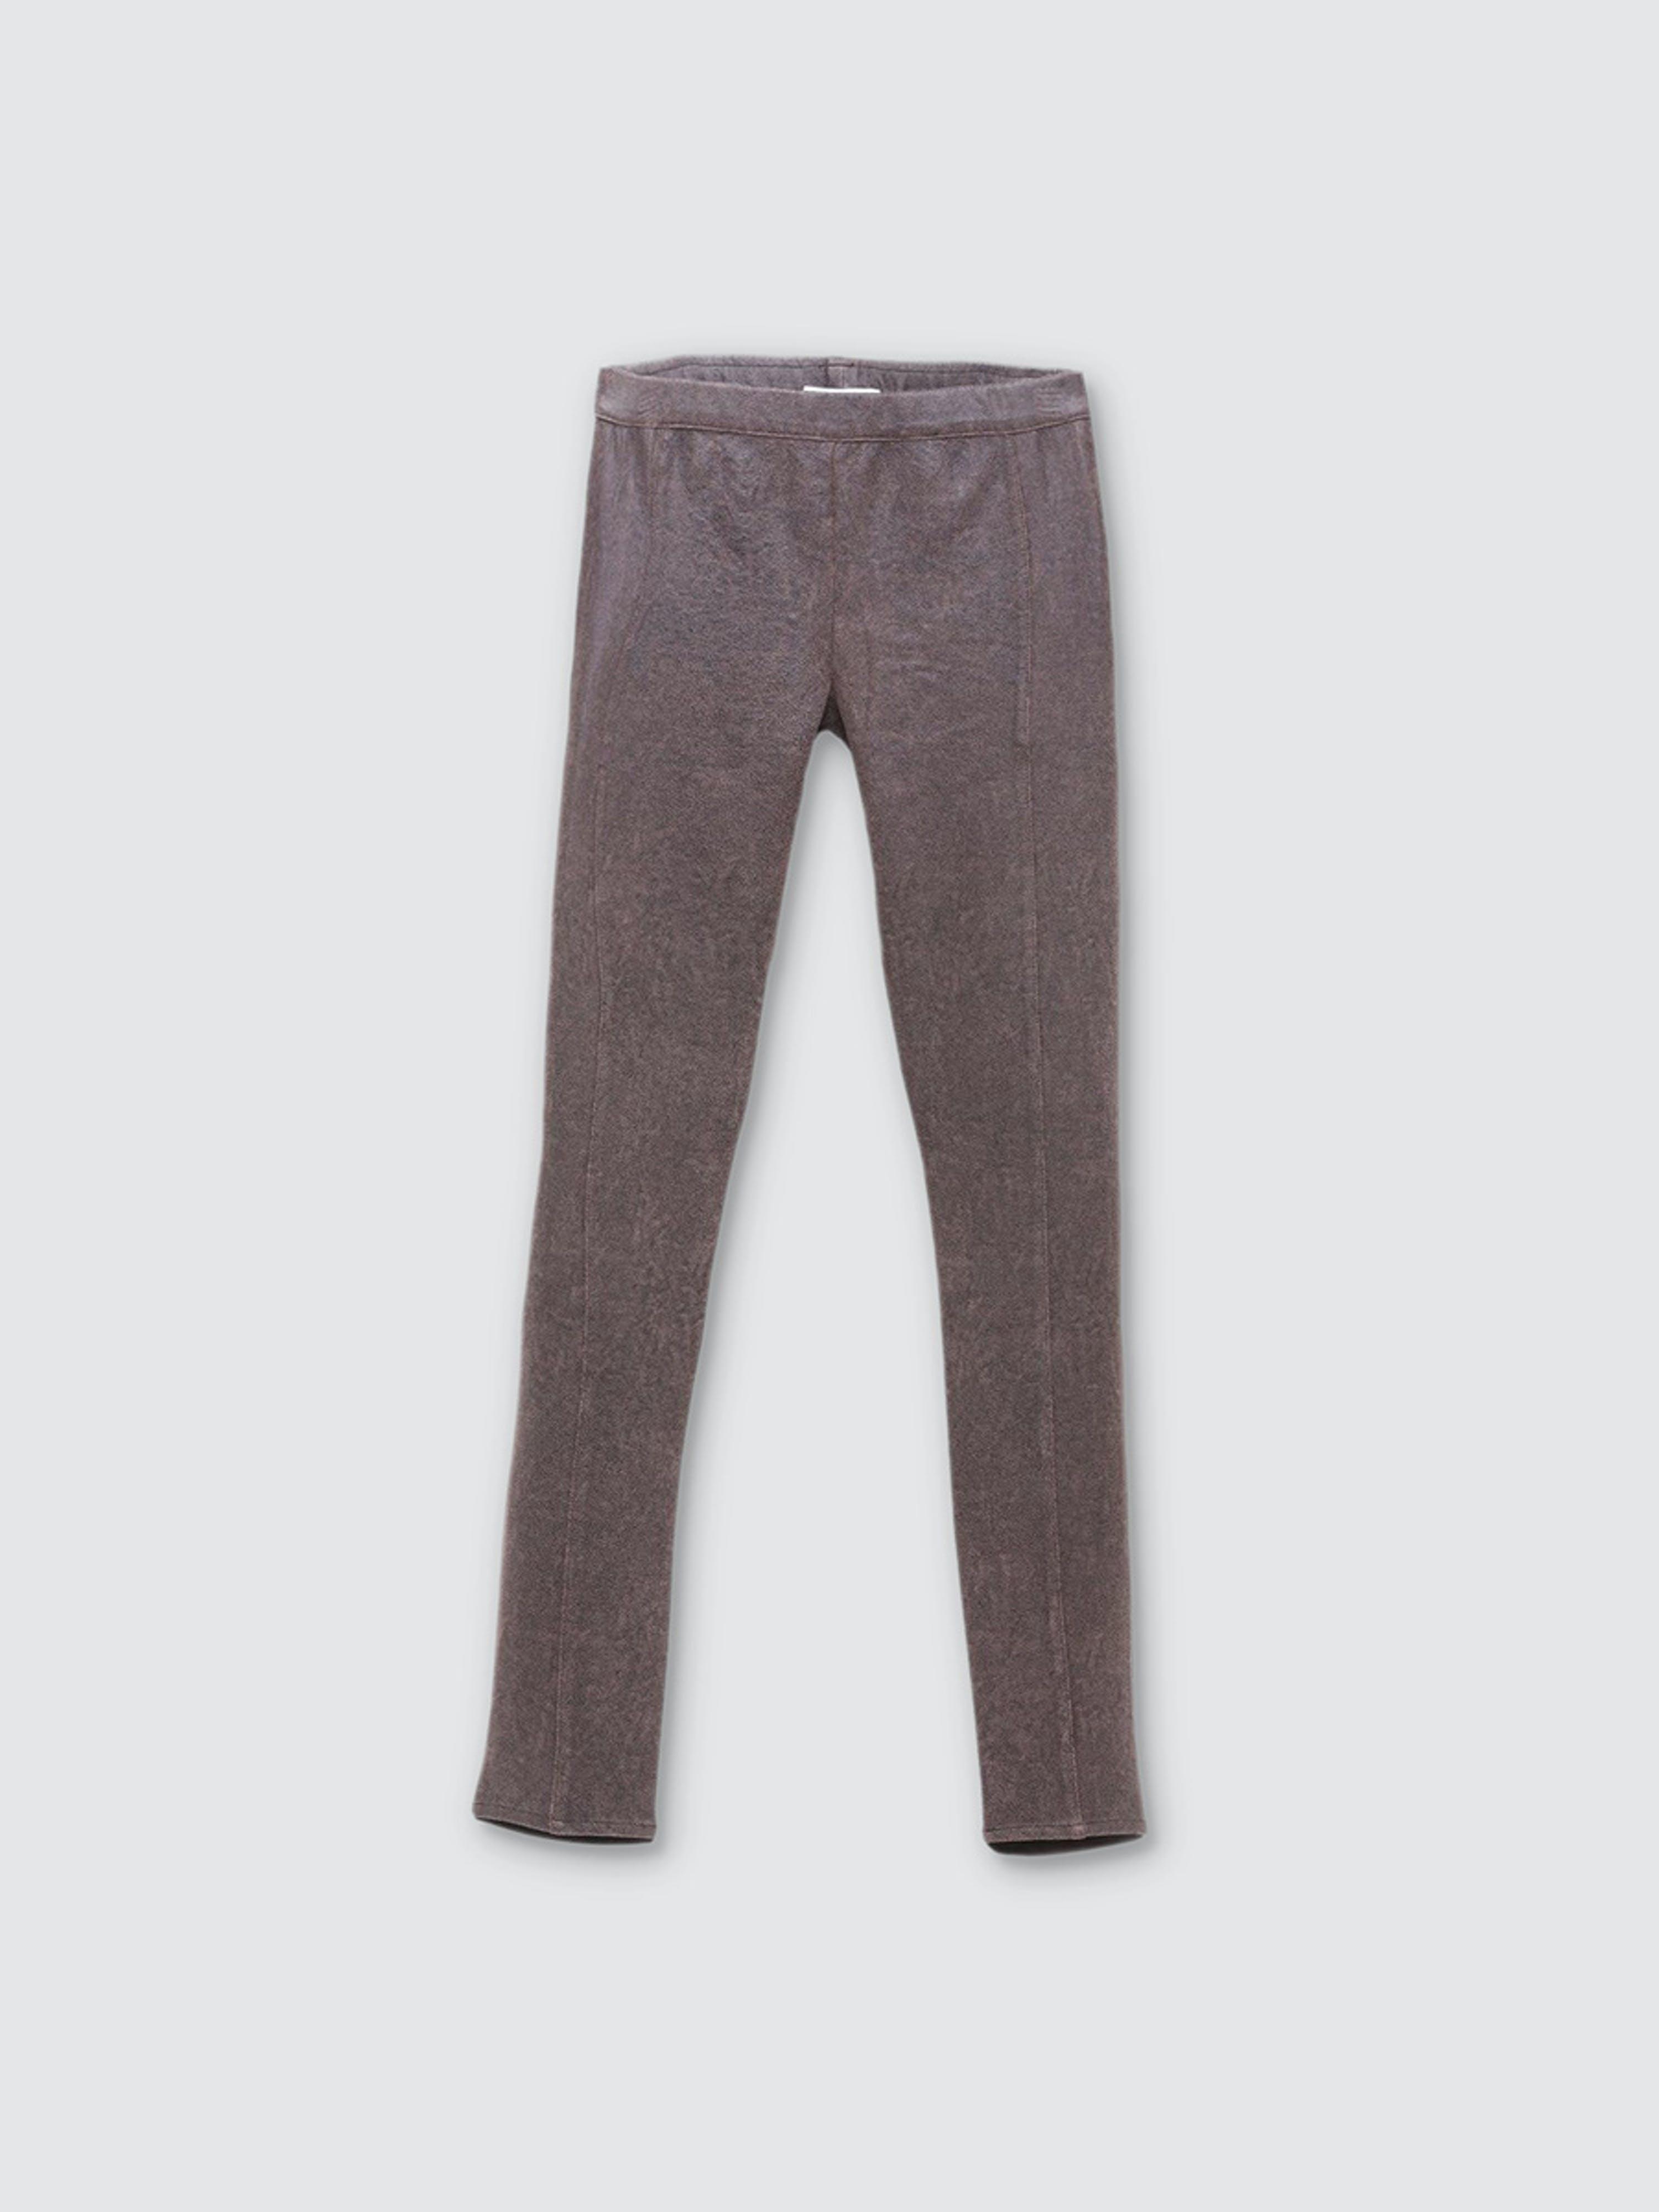 Astars Santa Fe Vegan Leather Leggings In Gray